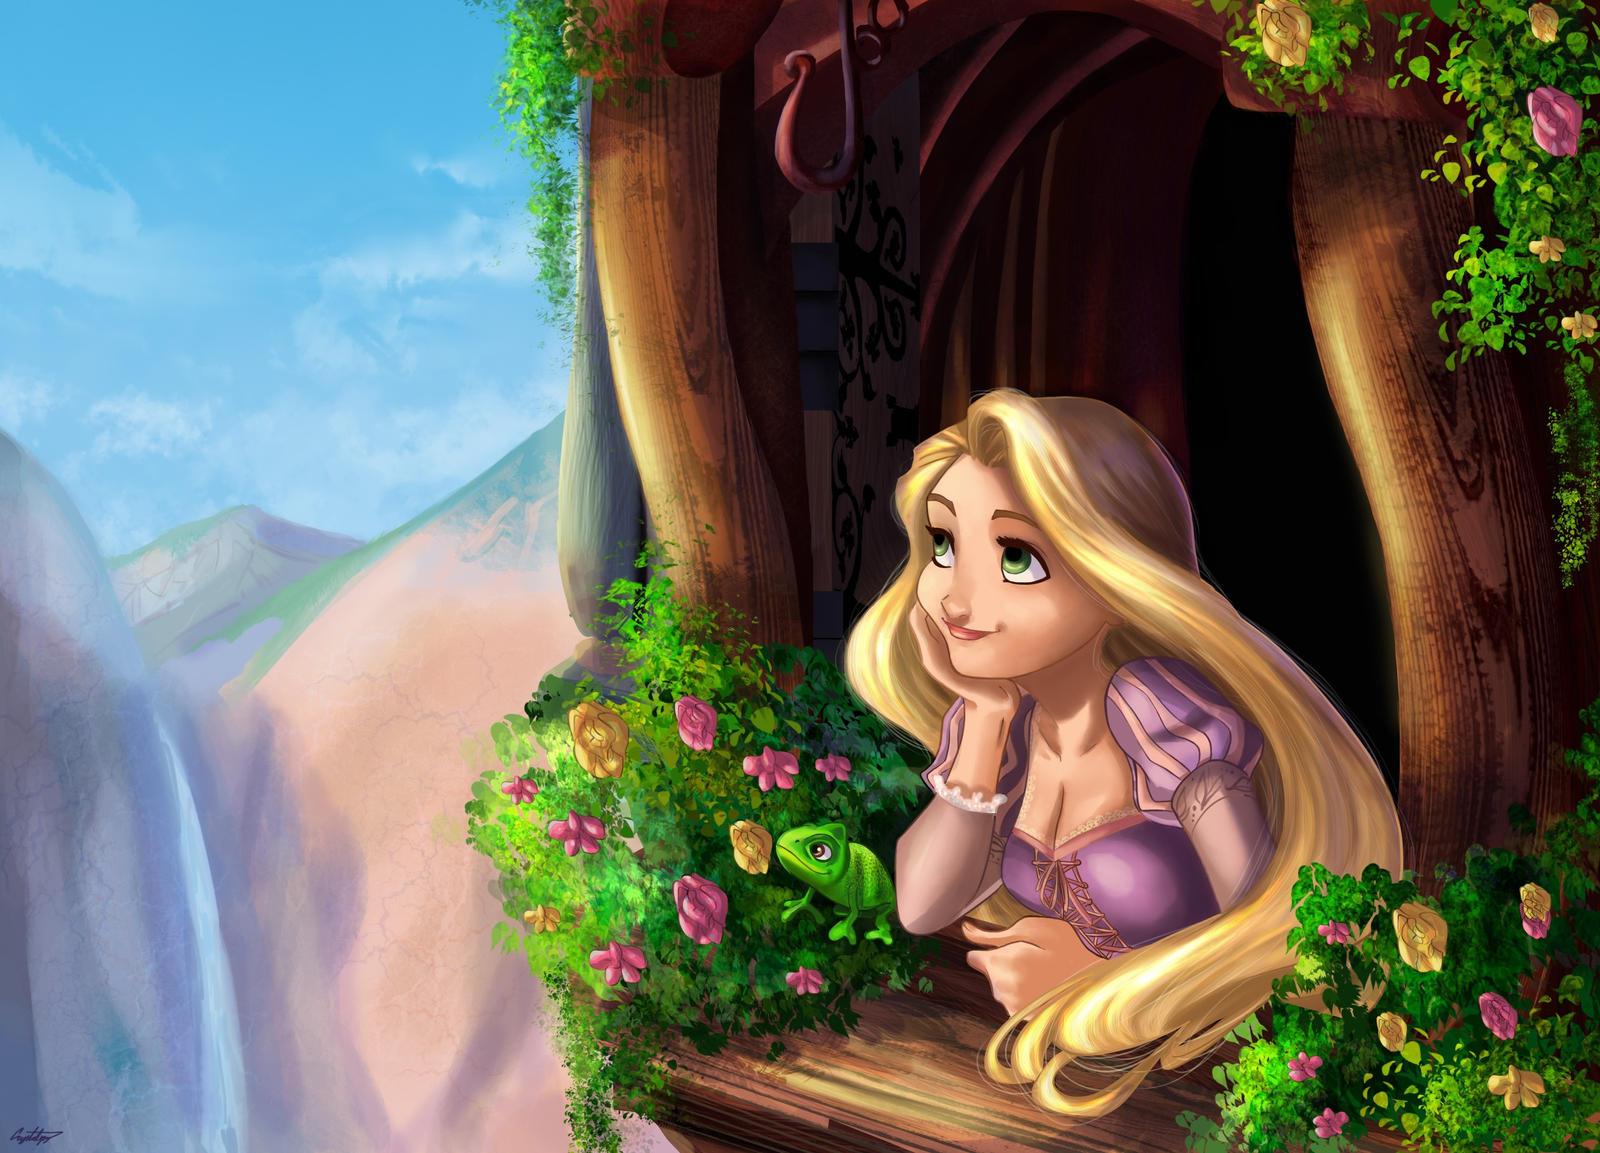 Rapunzel by ArtCrawl